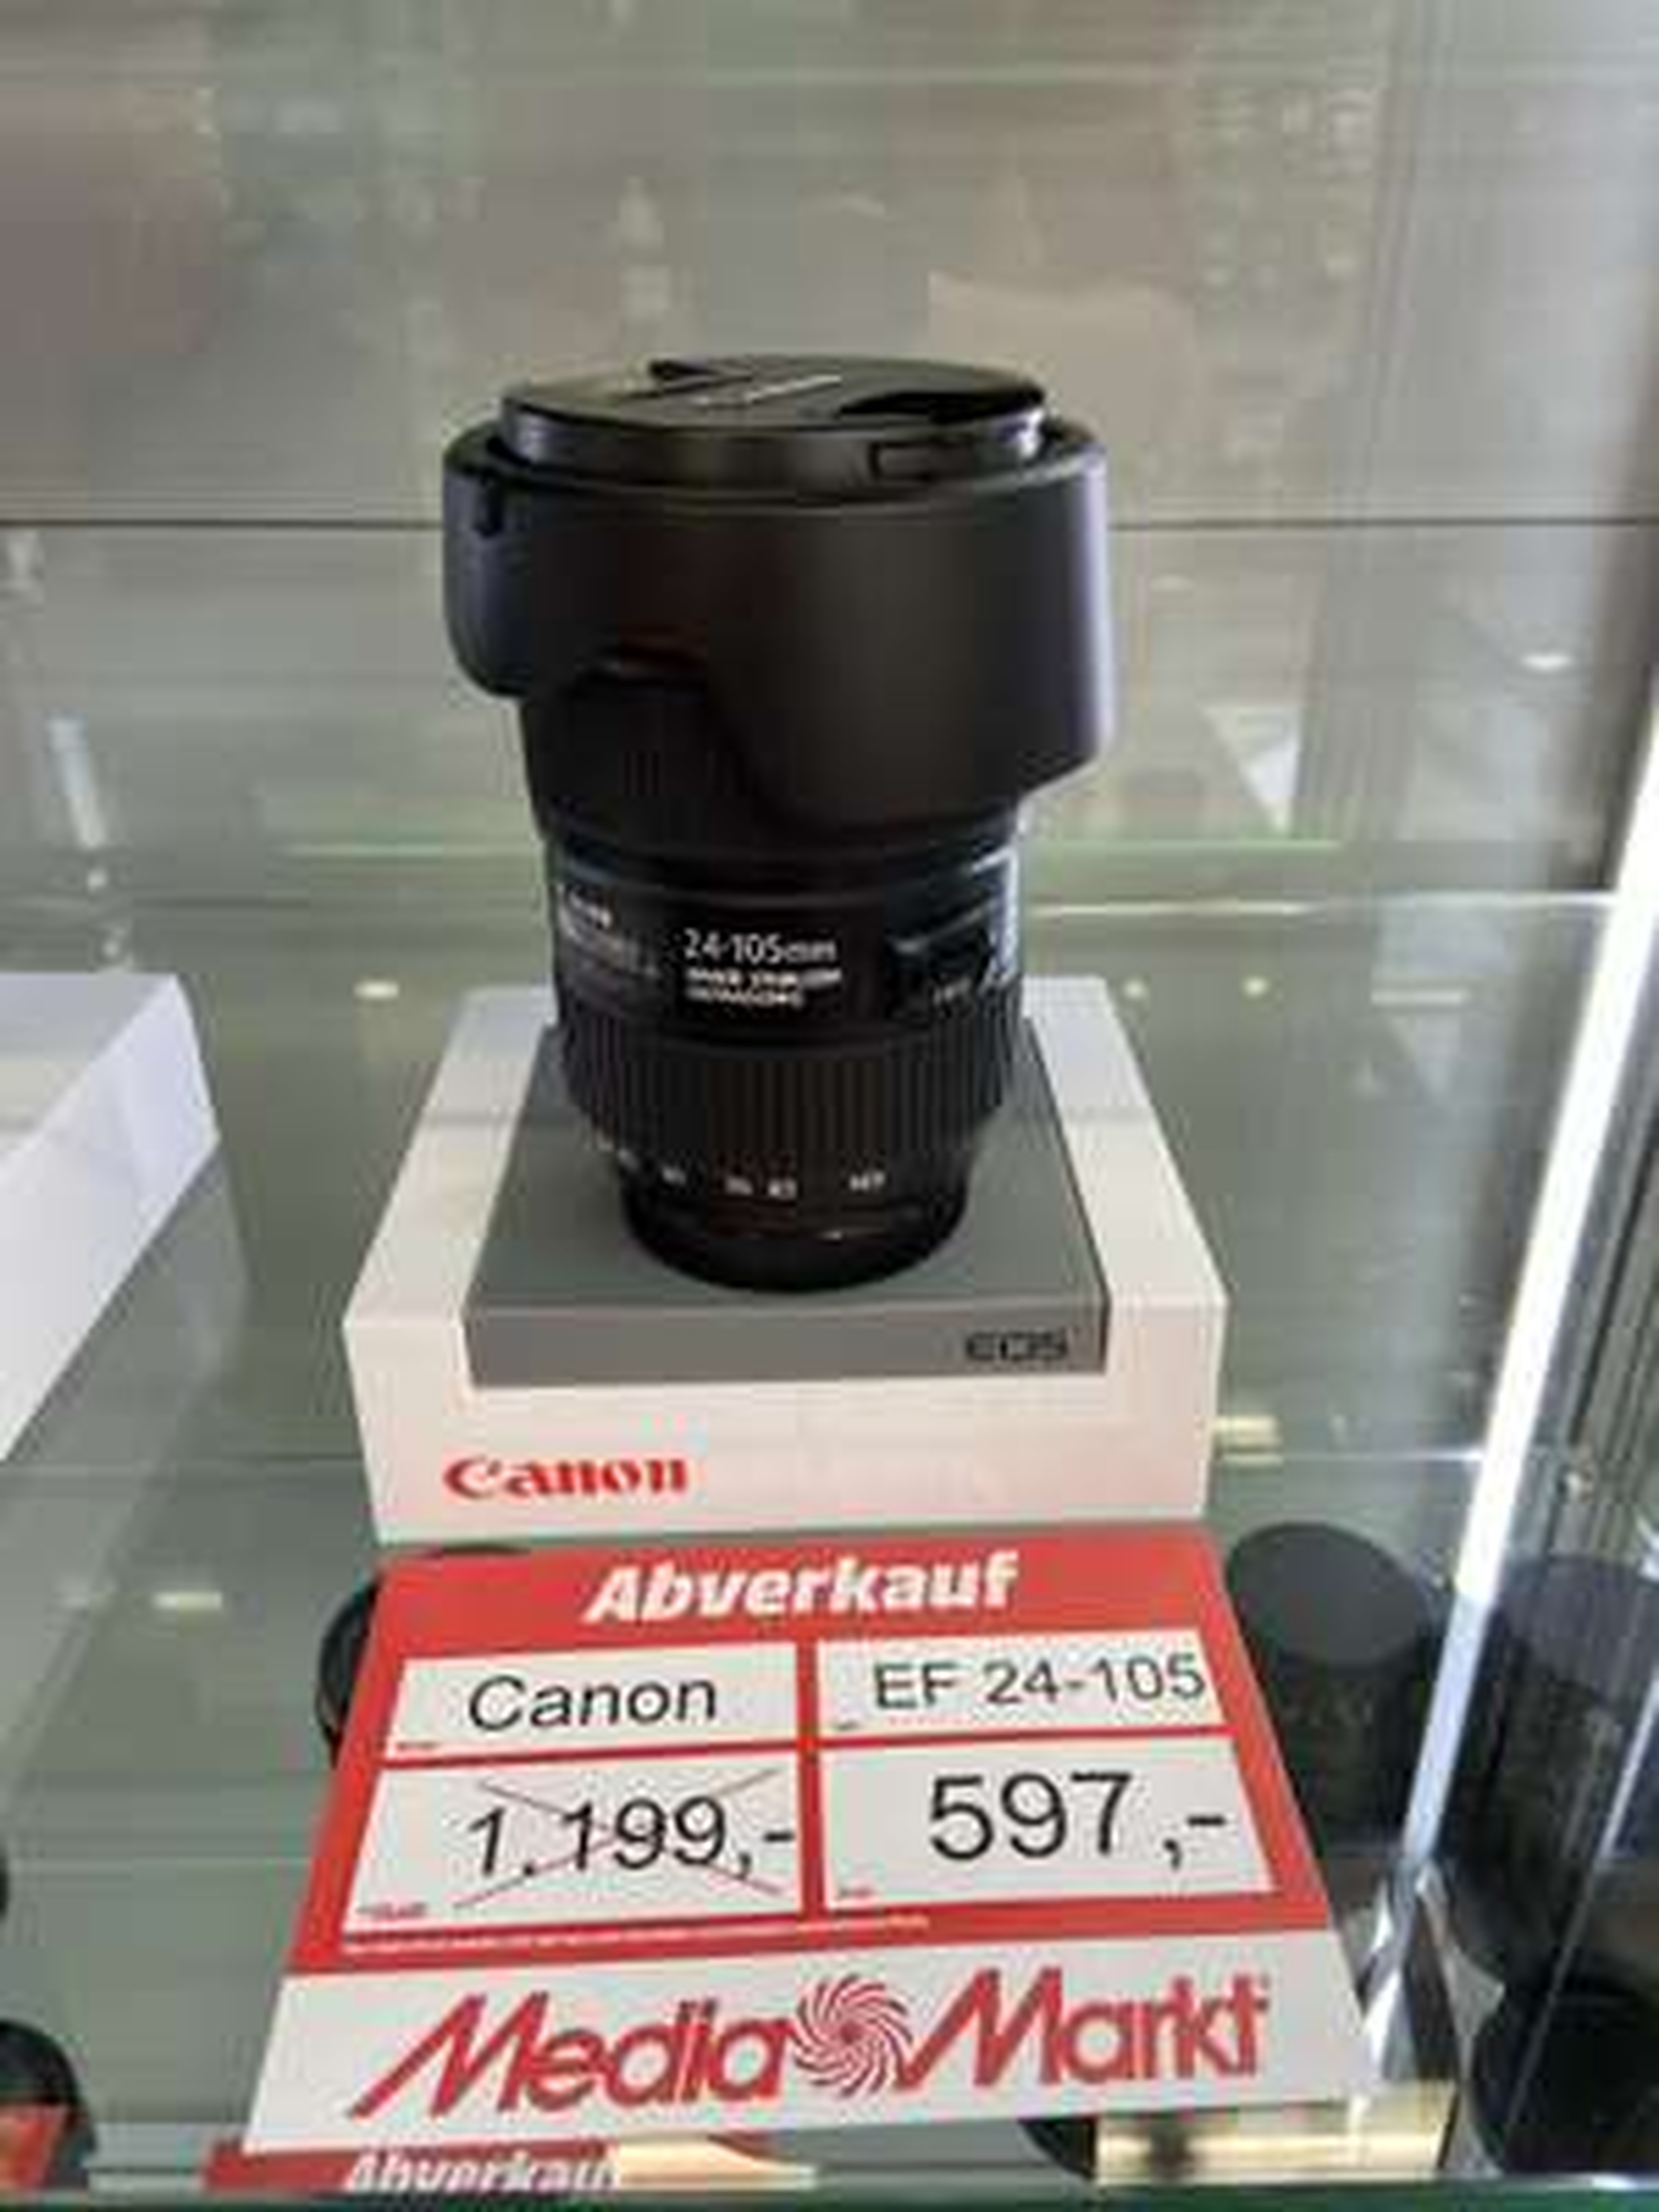 Kamera Abverkauf MediaMarkt Klagenfurt